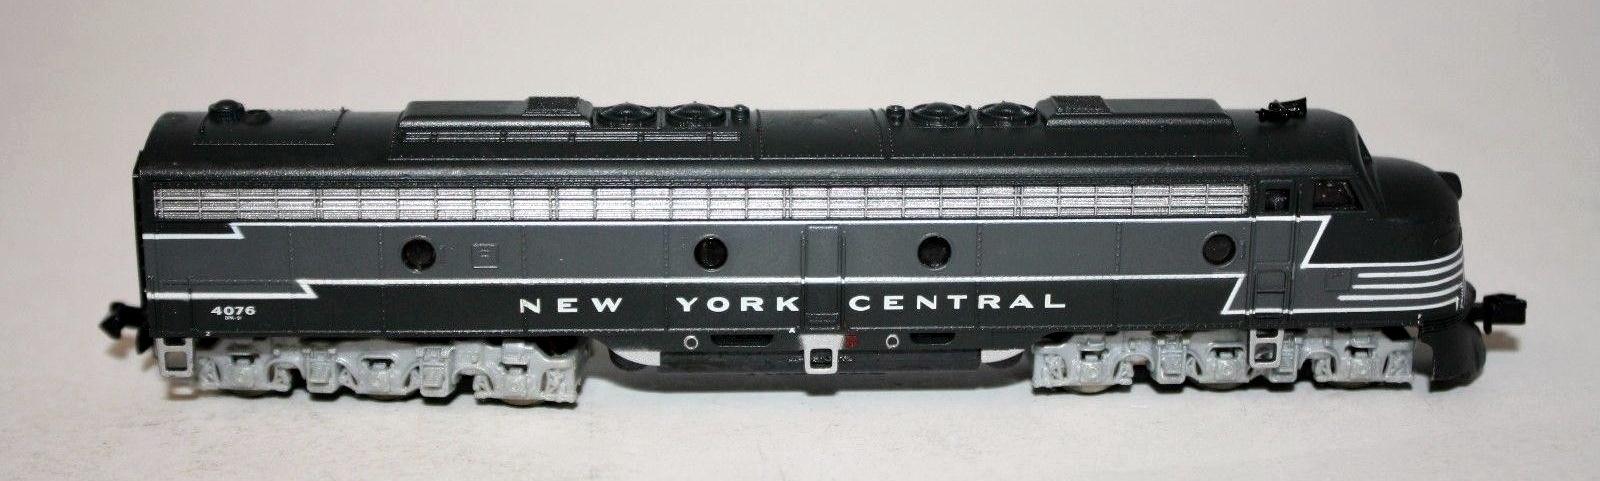 N Scale - Life-Like - 7213 - Locomotive, Diesel, EMD E8 - New York Central - 4076